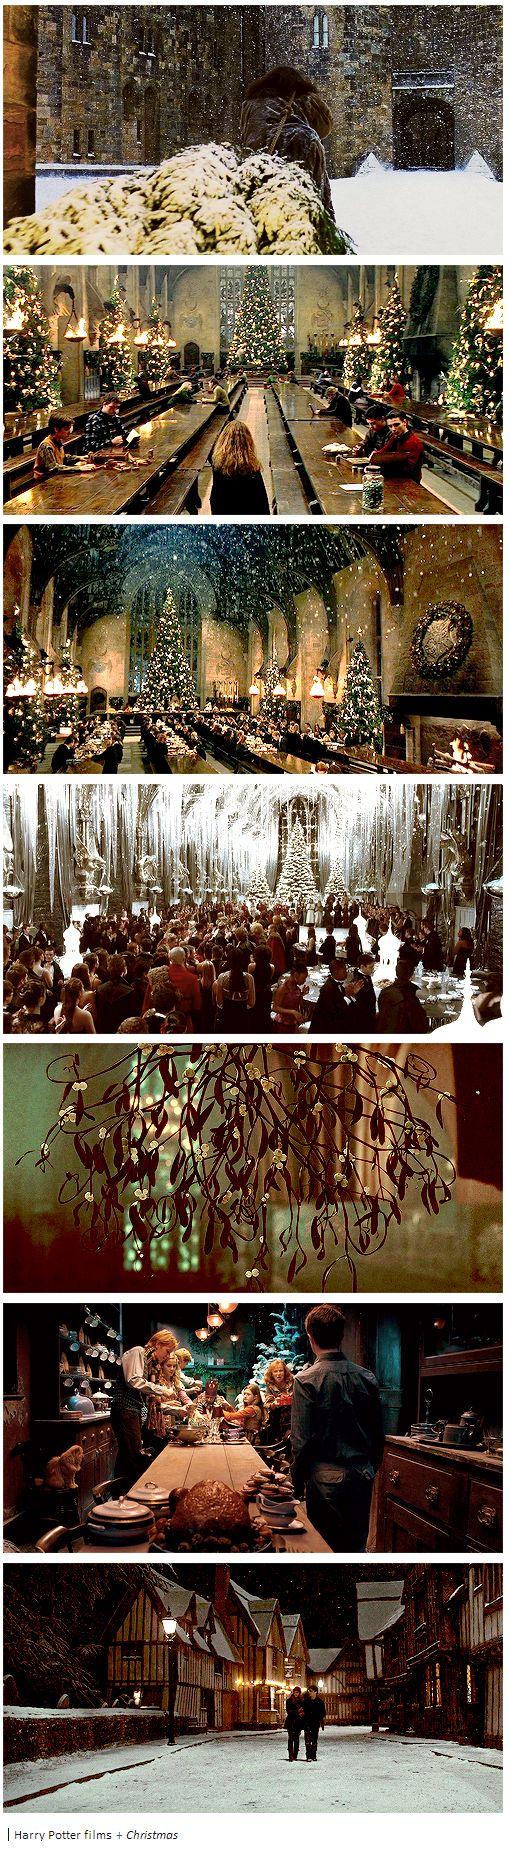 Christmas Hogwarts.jpg